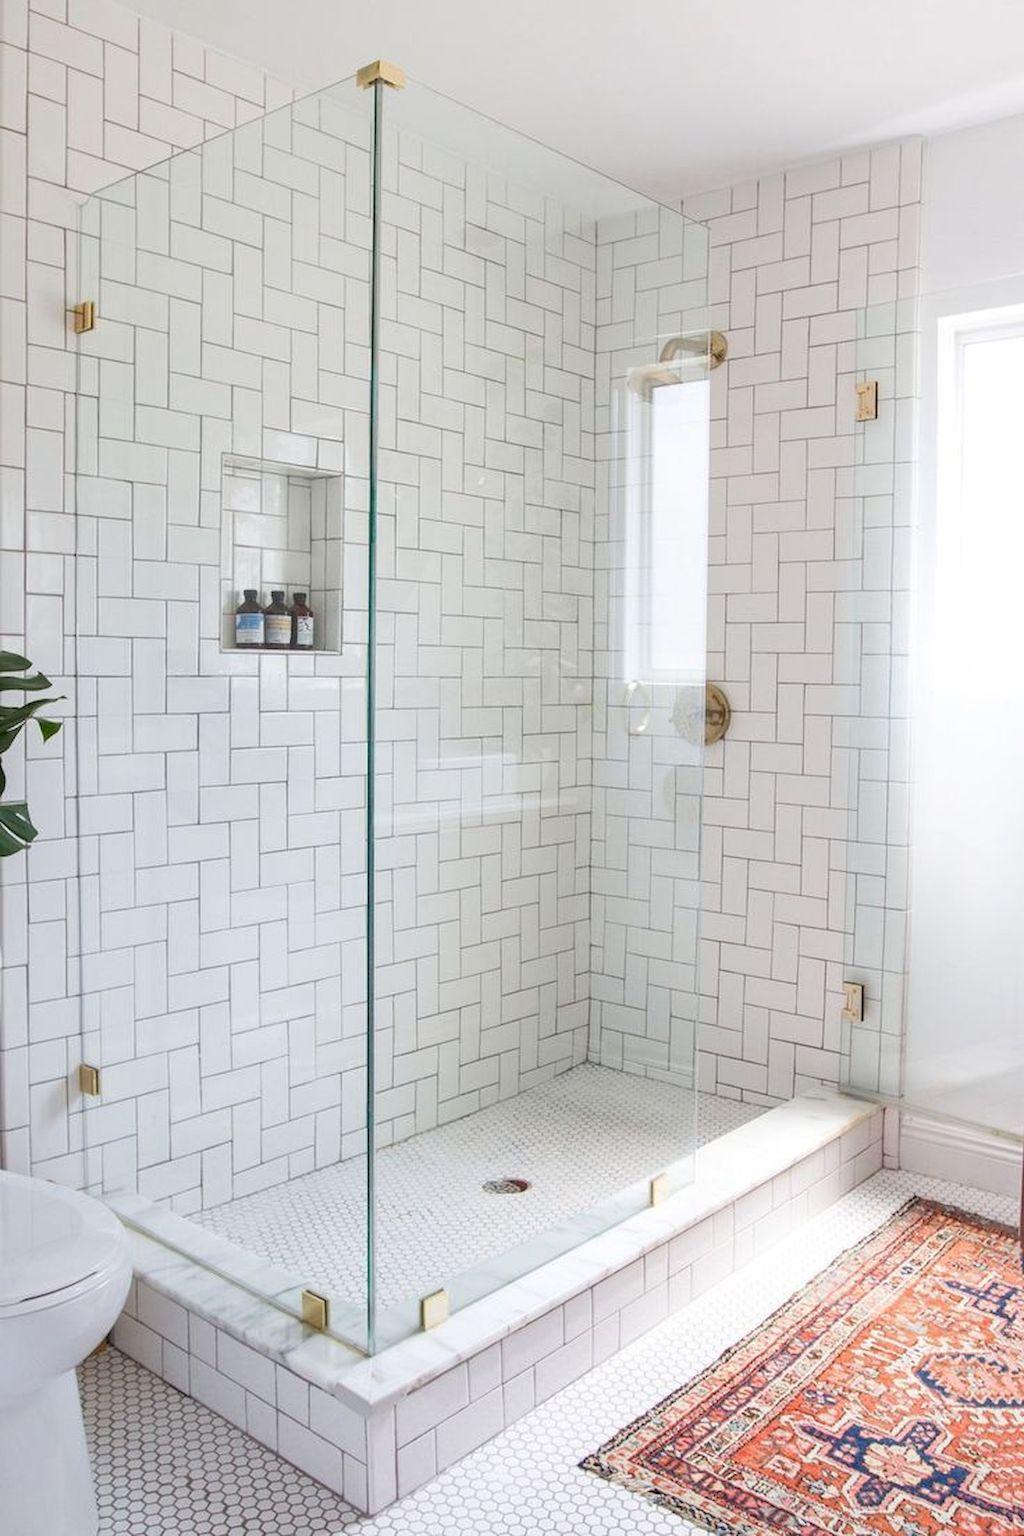 Luxurious Stylish Color Scheme For Your Bathroom